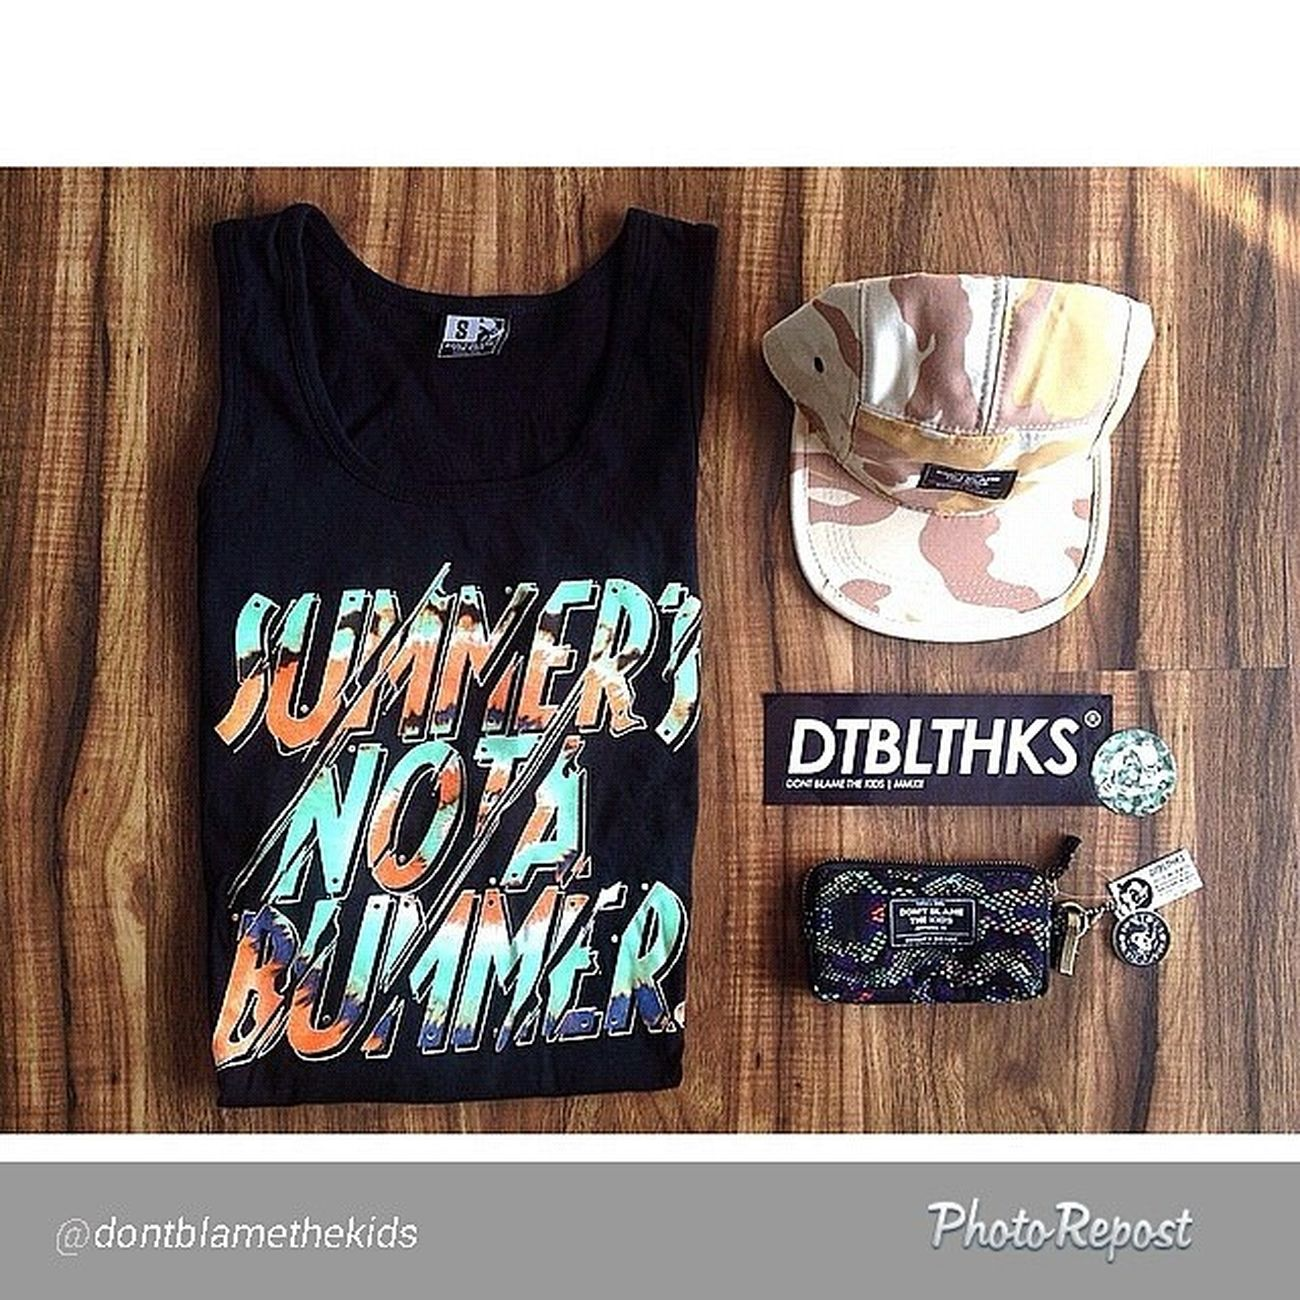 DBTK Giveaway!!! Dontblamethekidsyeartwo